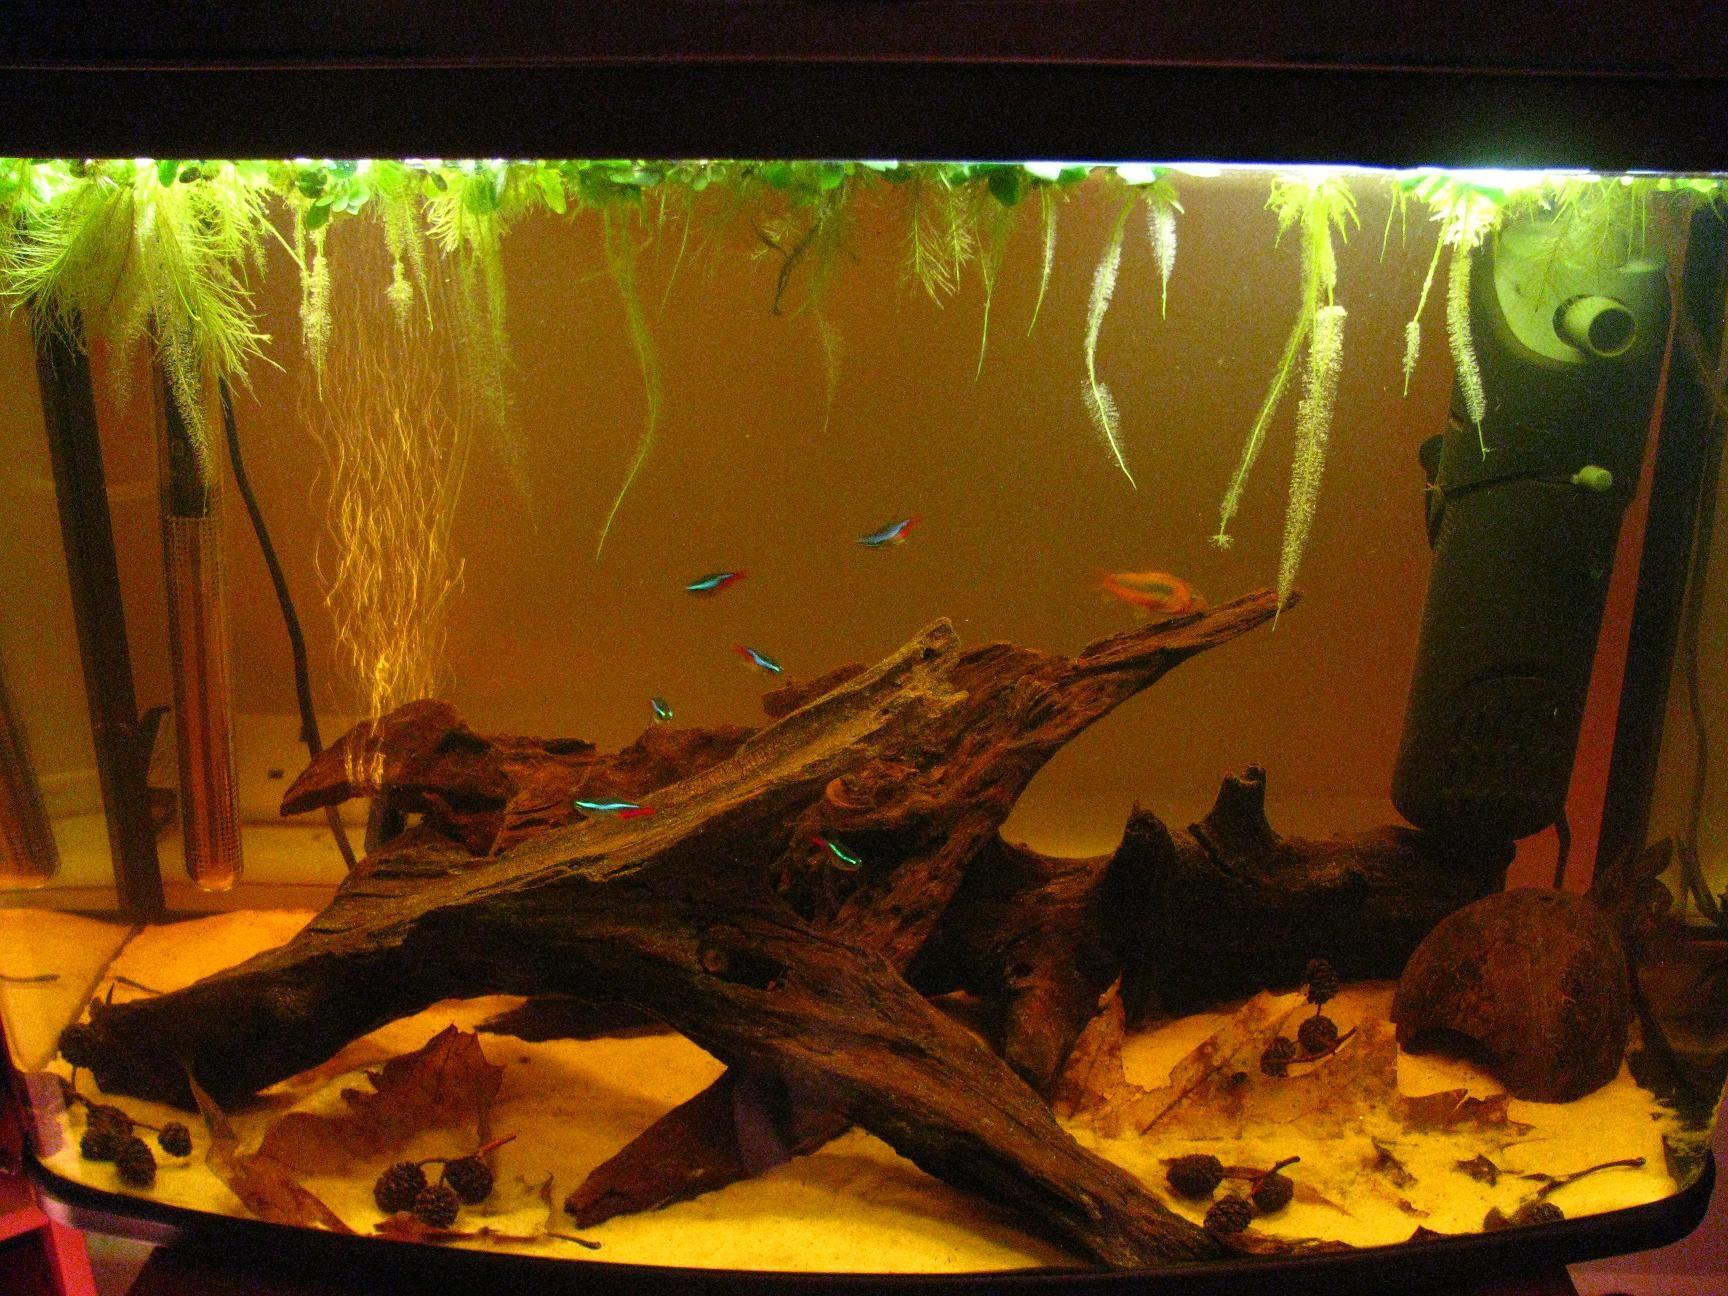 Frais De Aquarium Tropical Sch¨me Idées de table